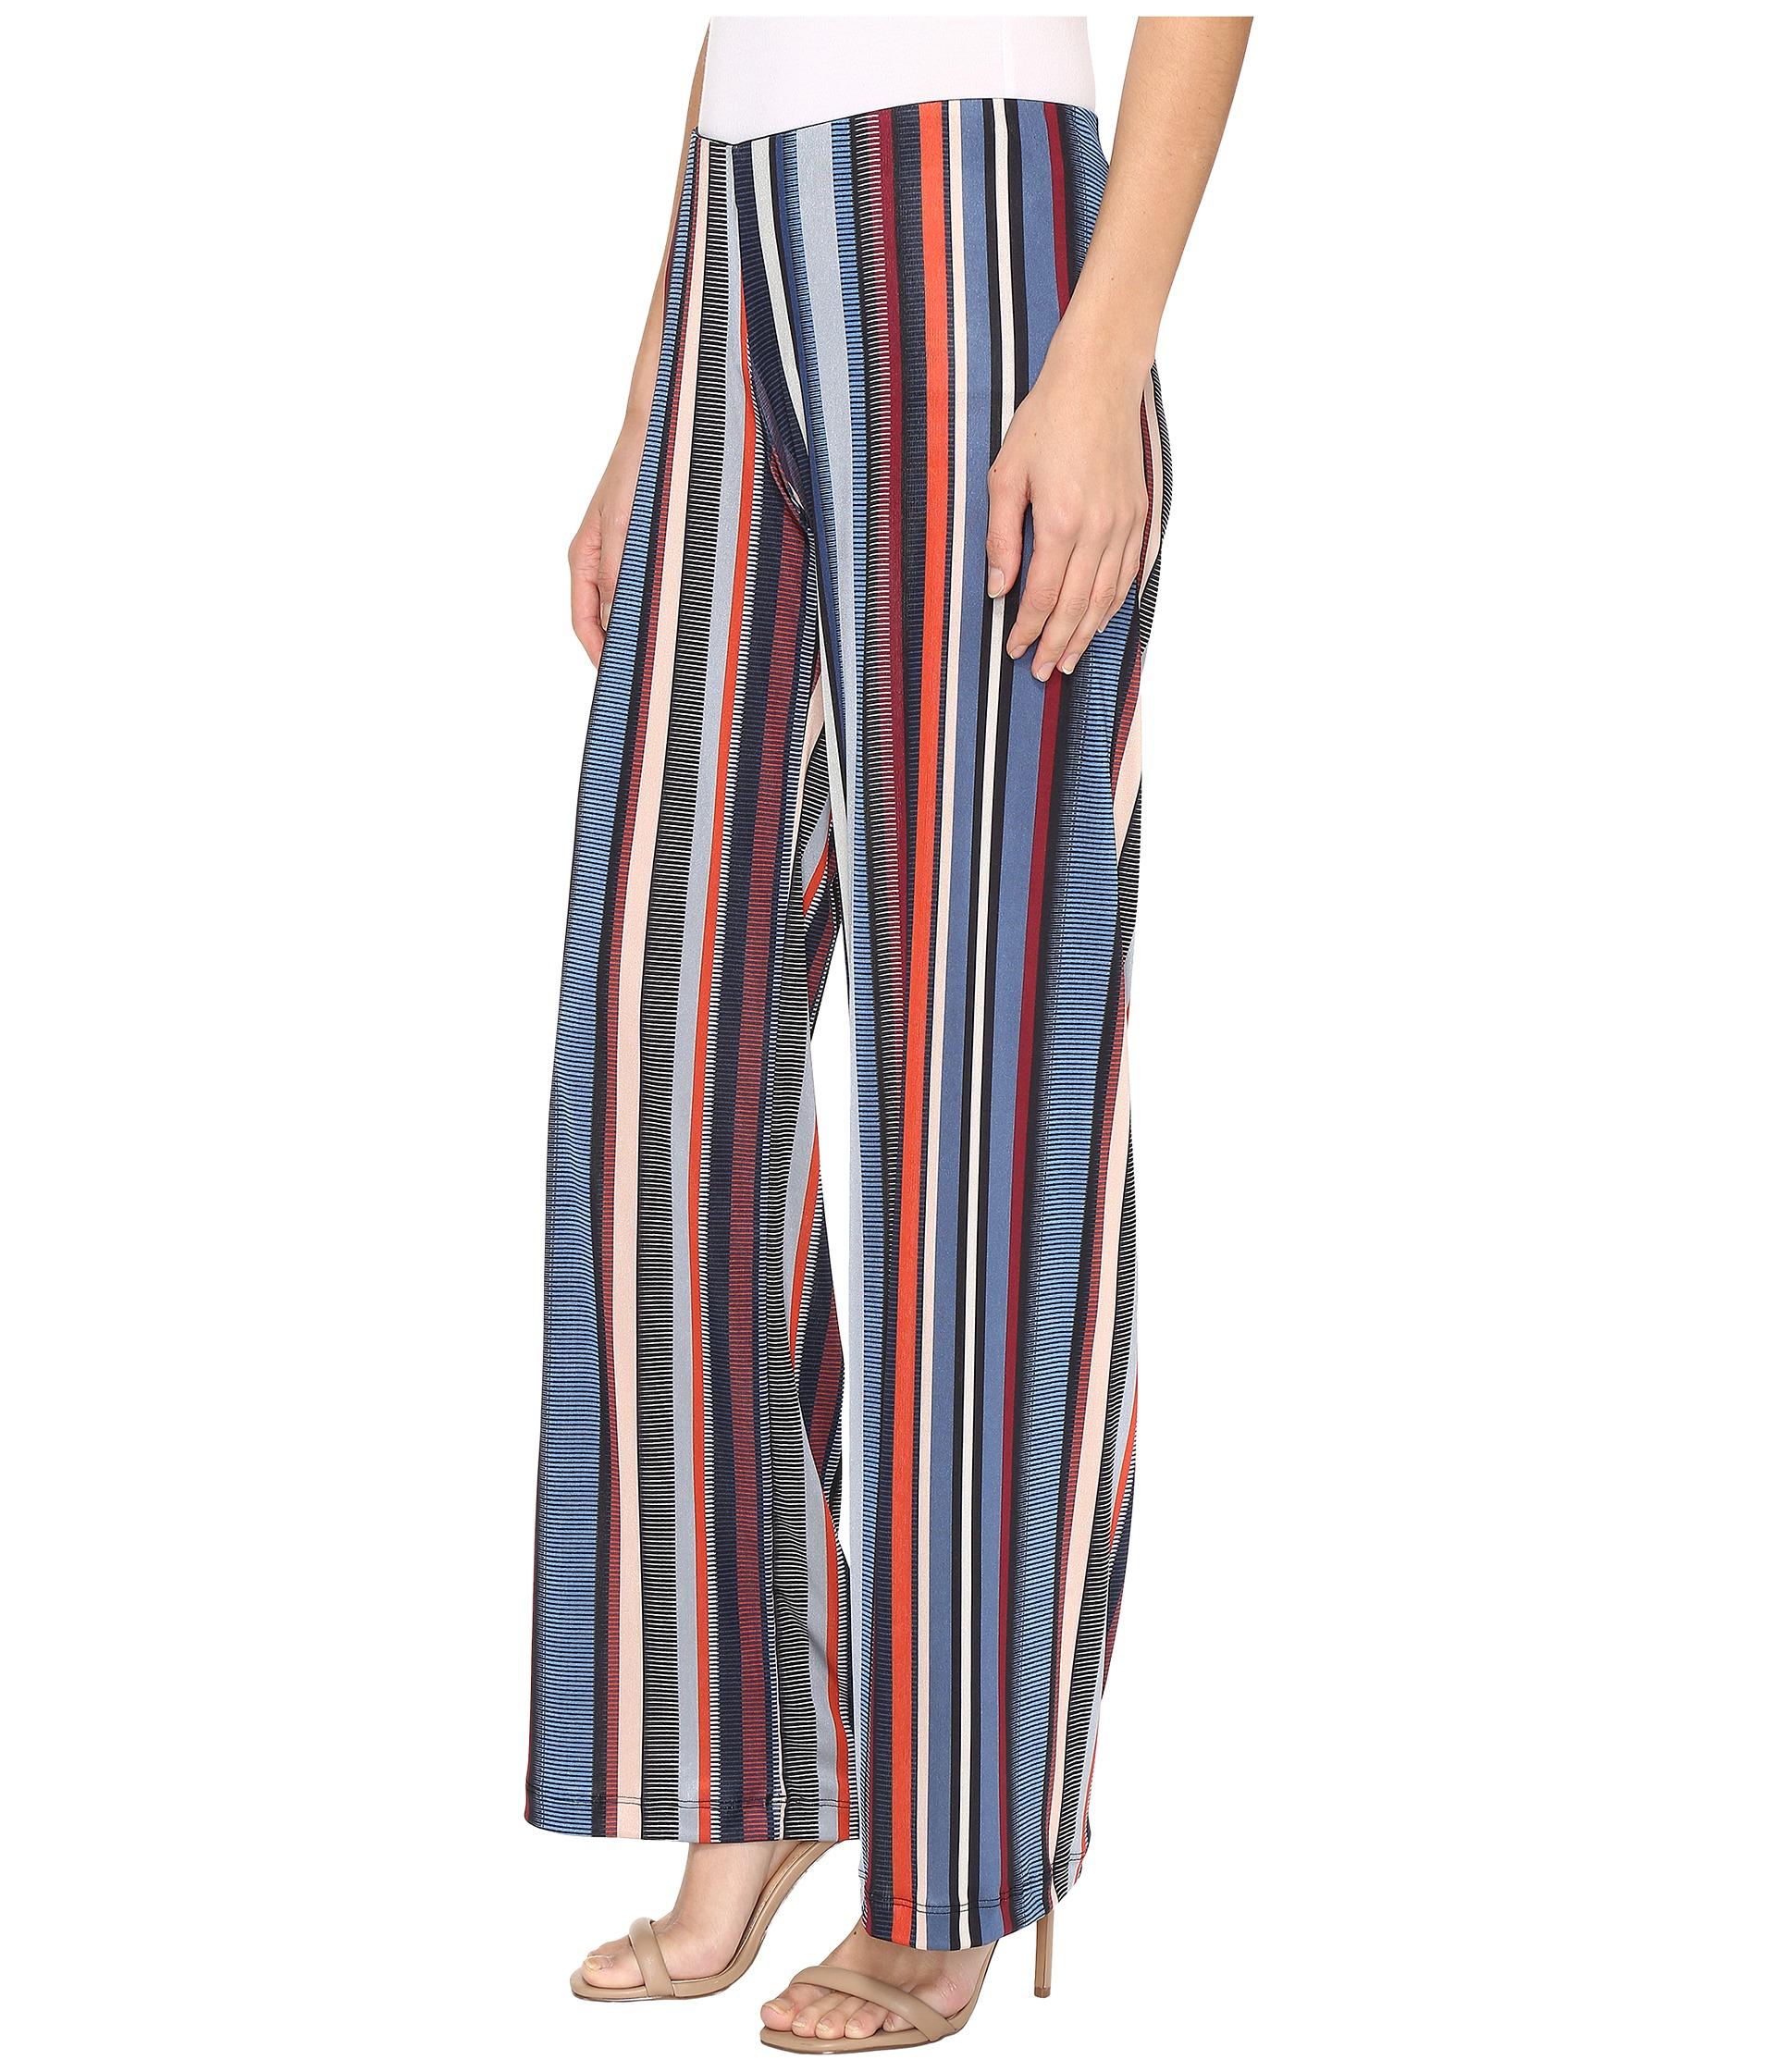 mens striped pants - ShopStyle